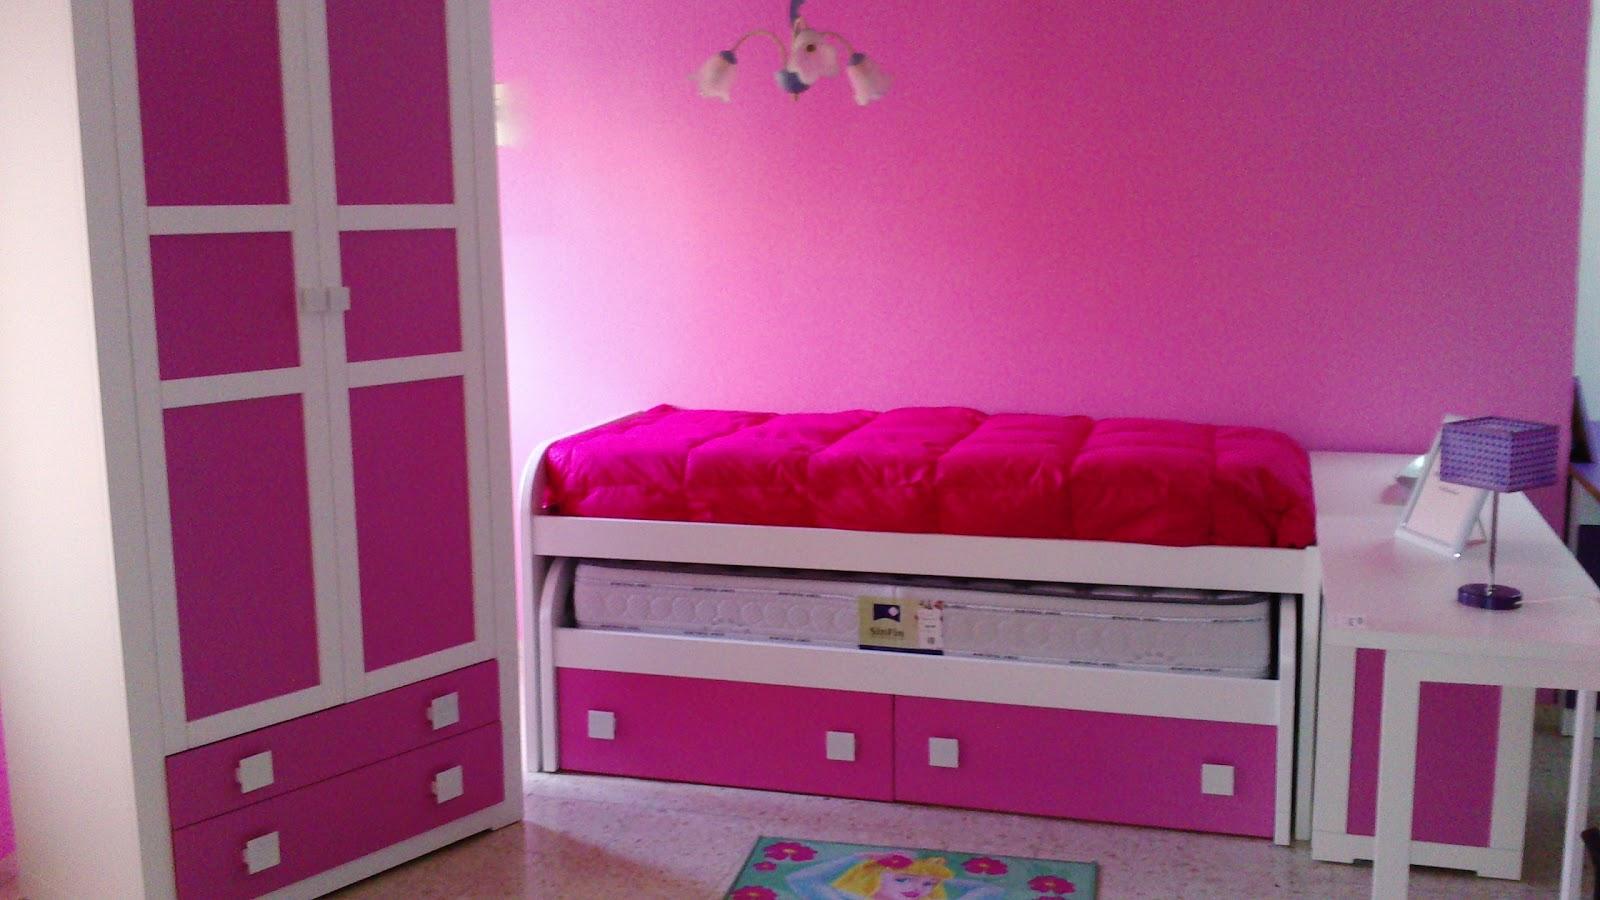 Muebles escalante dormitorios juveniles - Dormitorios juveniles madera ...